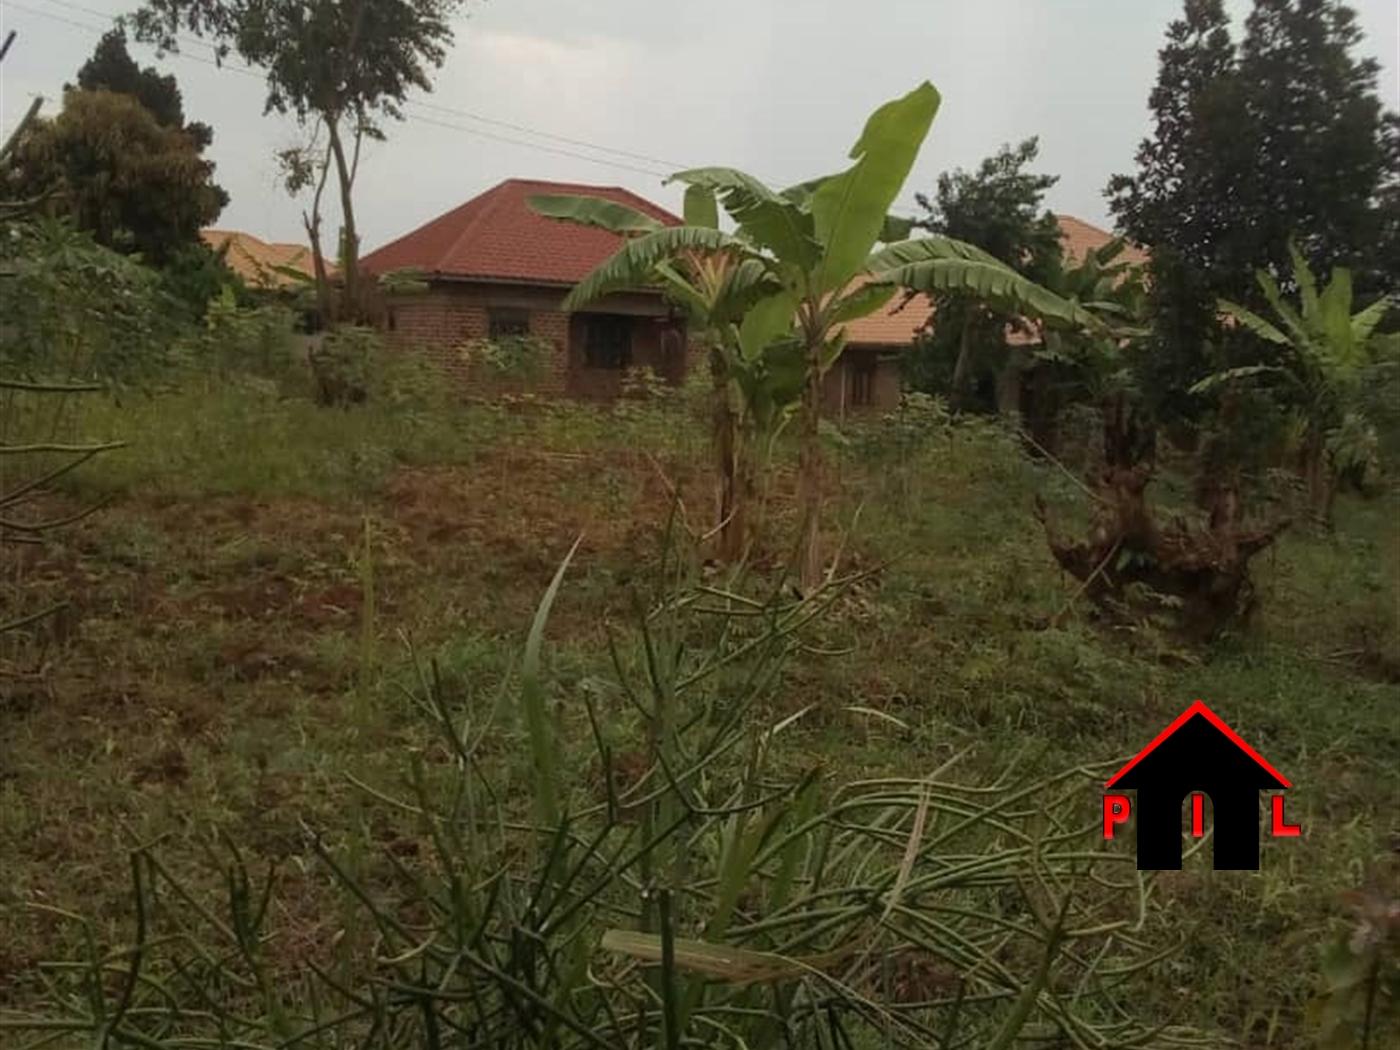 Residential Land for sale in Bububi Luwero